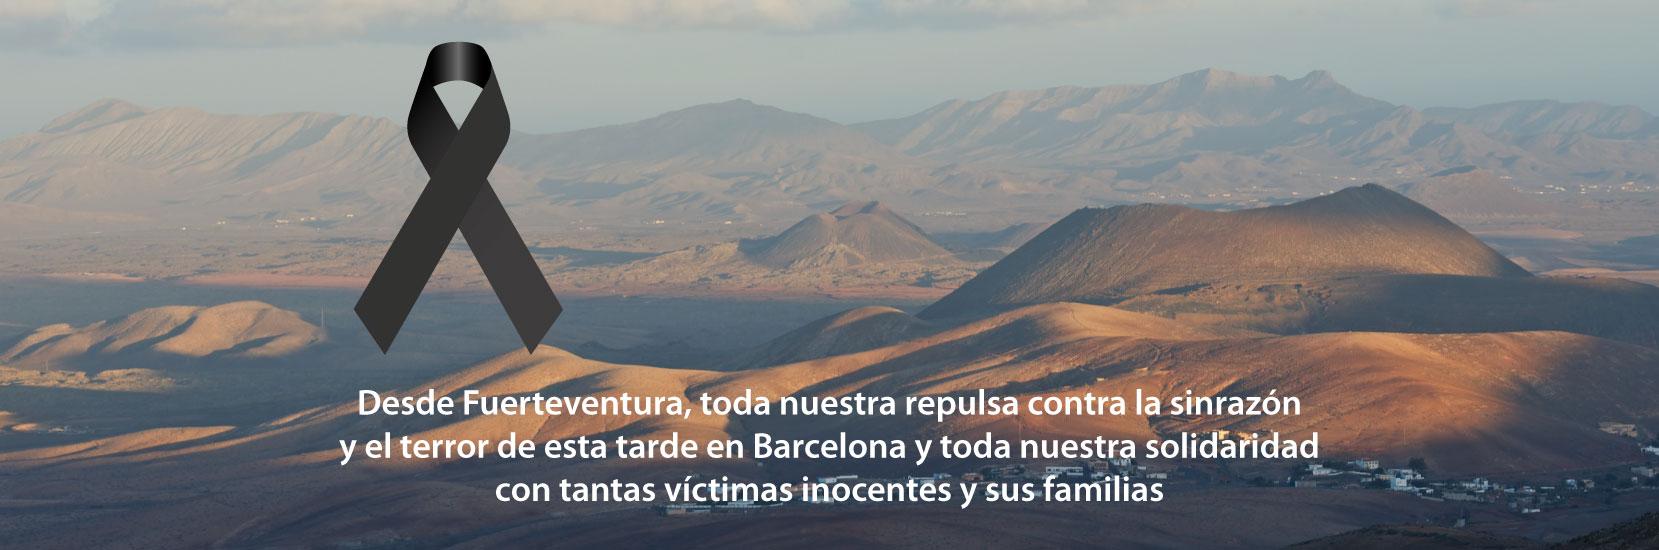 Banner_Repulsa_Atentado_Barcelona